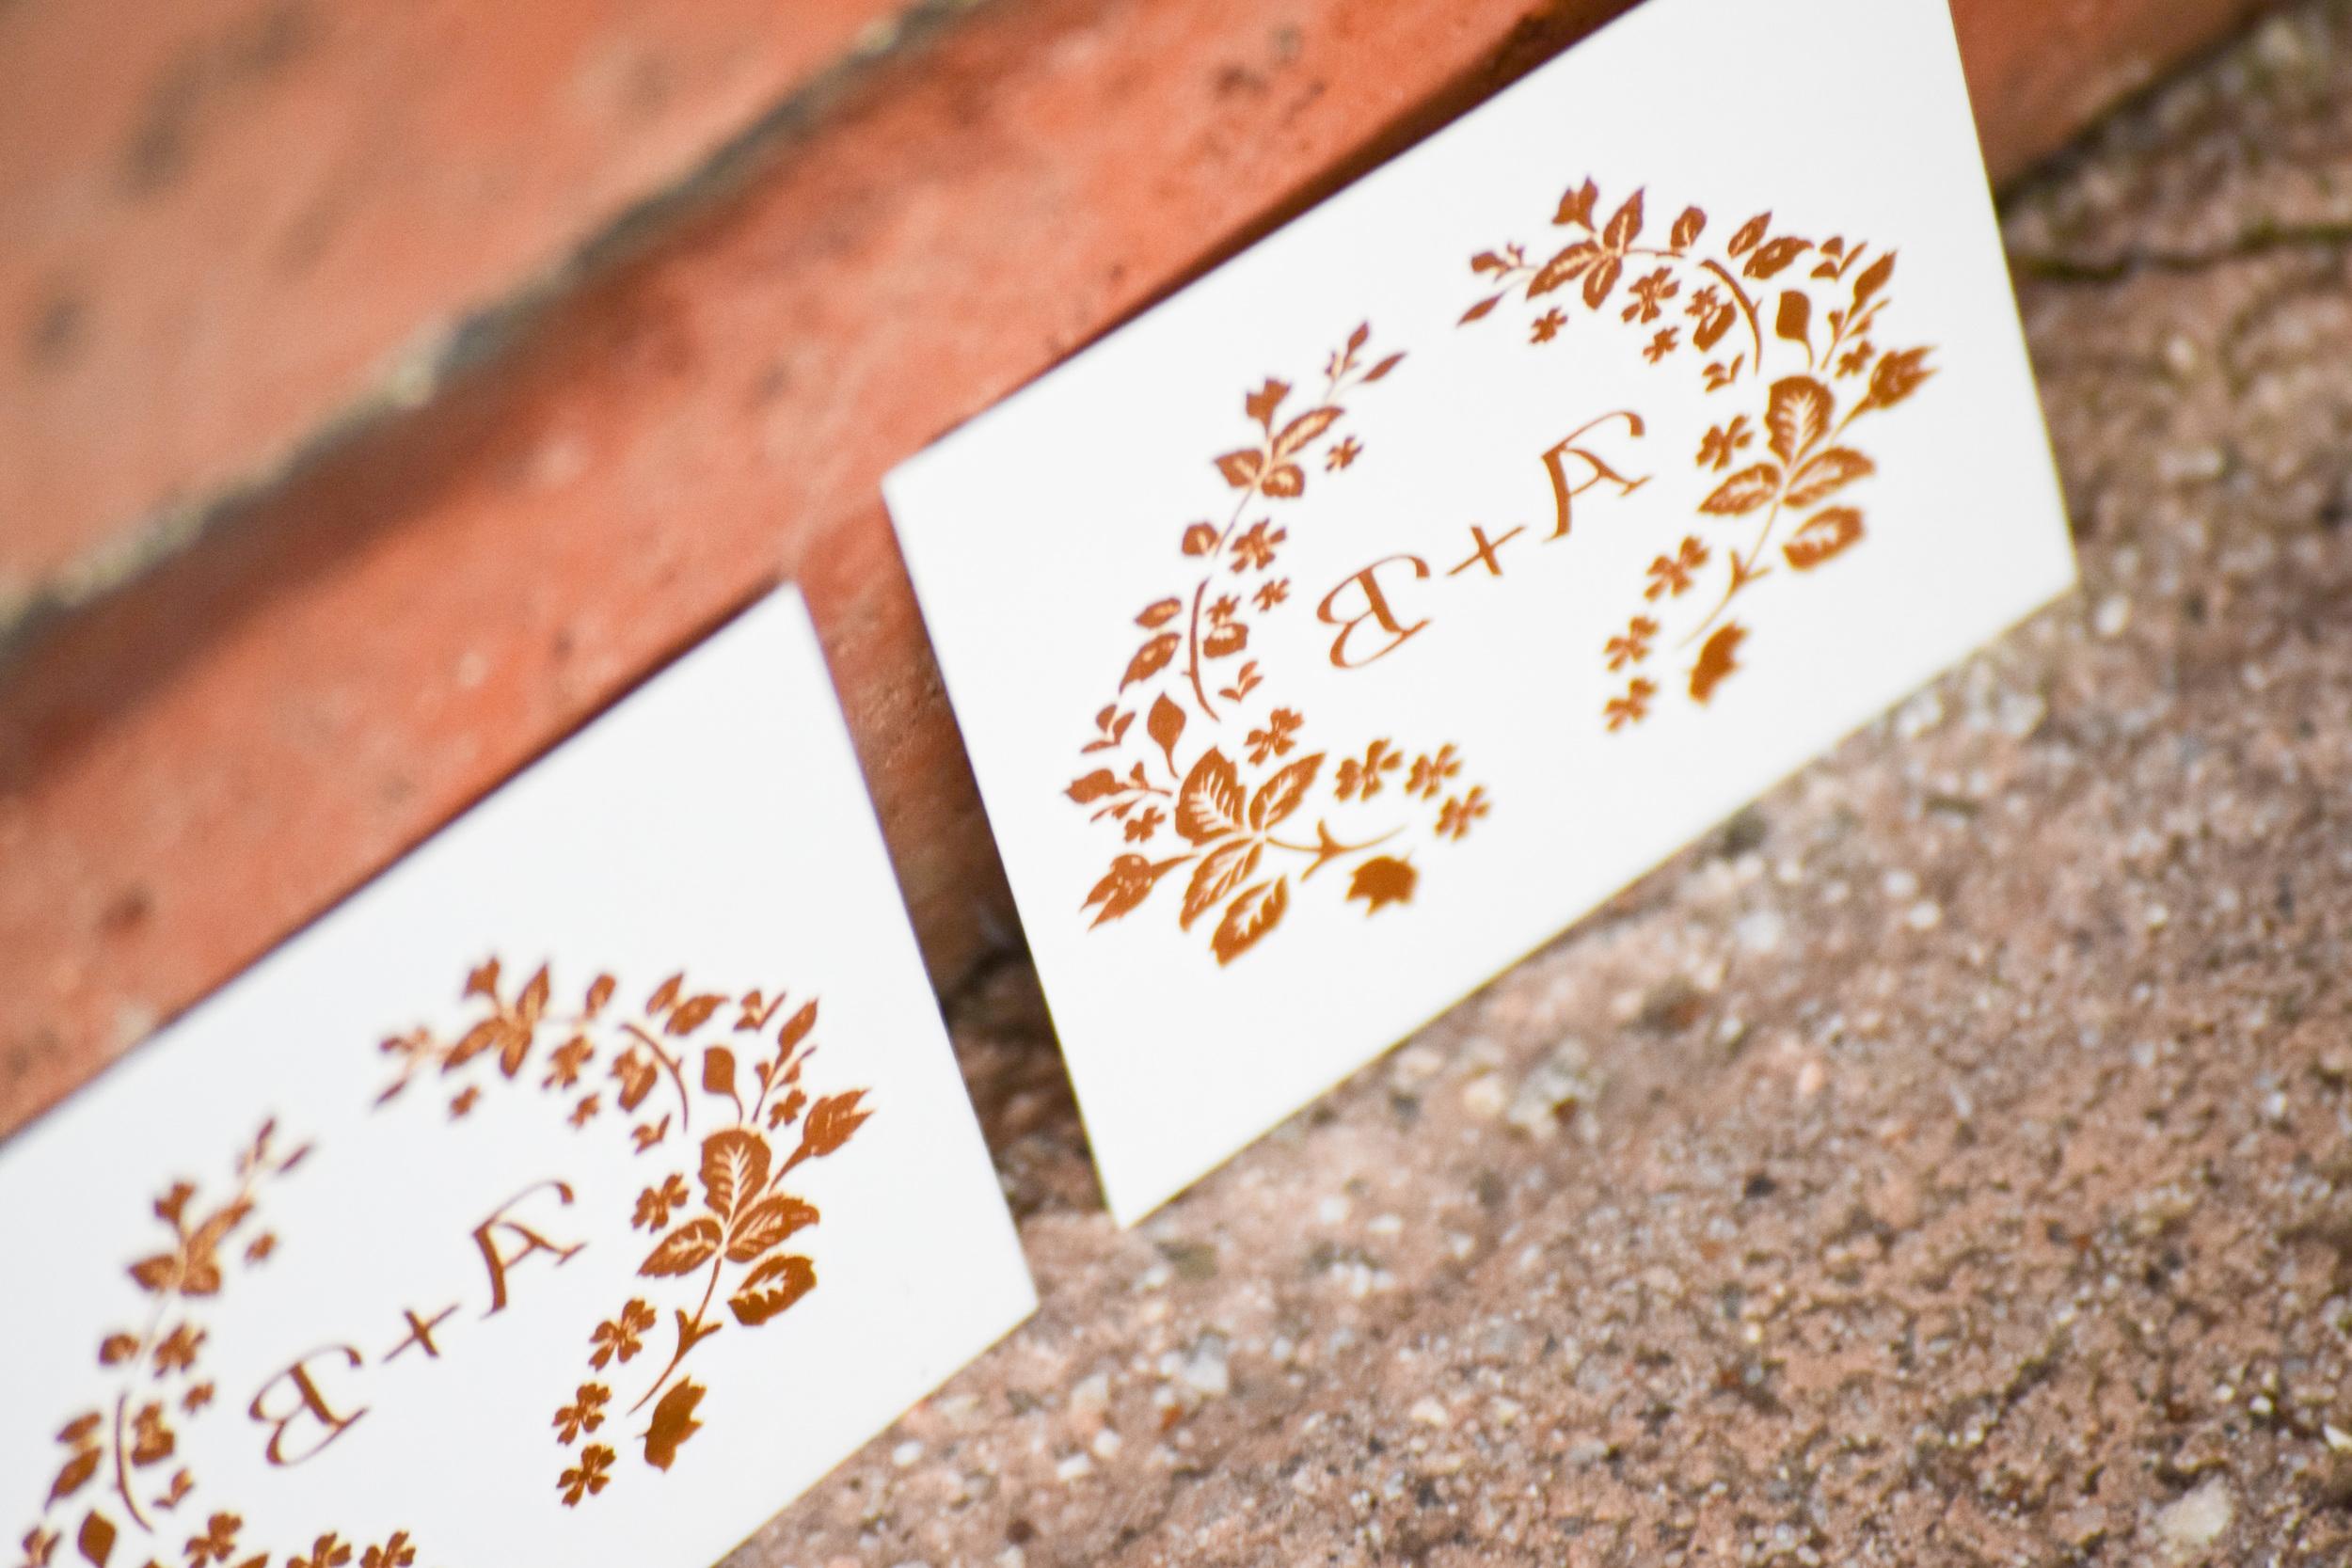 gold foil bahcelorette tattoos